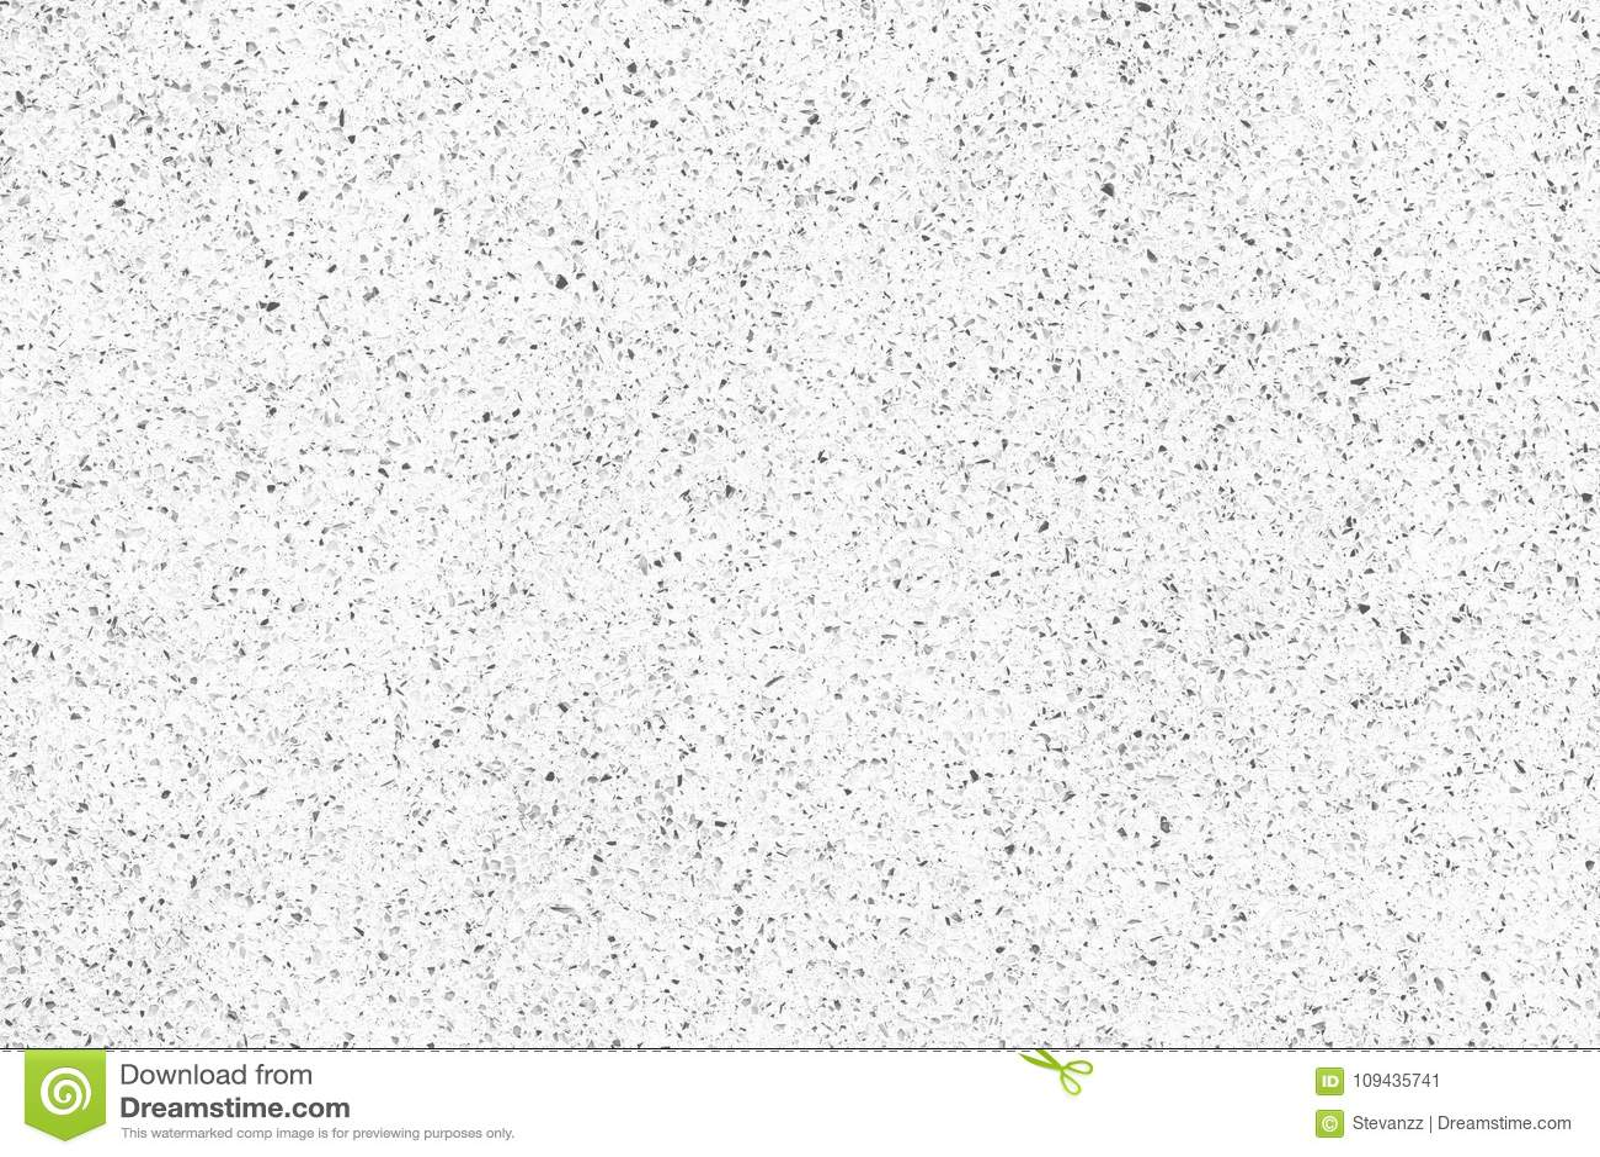 Quartz Surface White For Bathroom Or Kitchen Countertop Stock Image ...